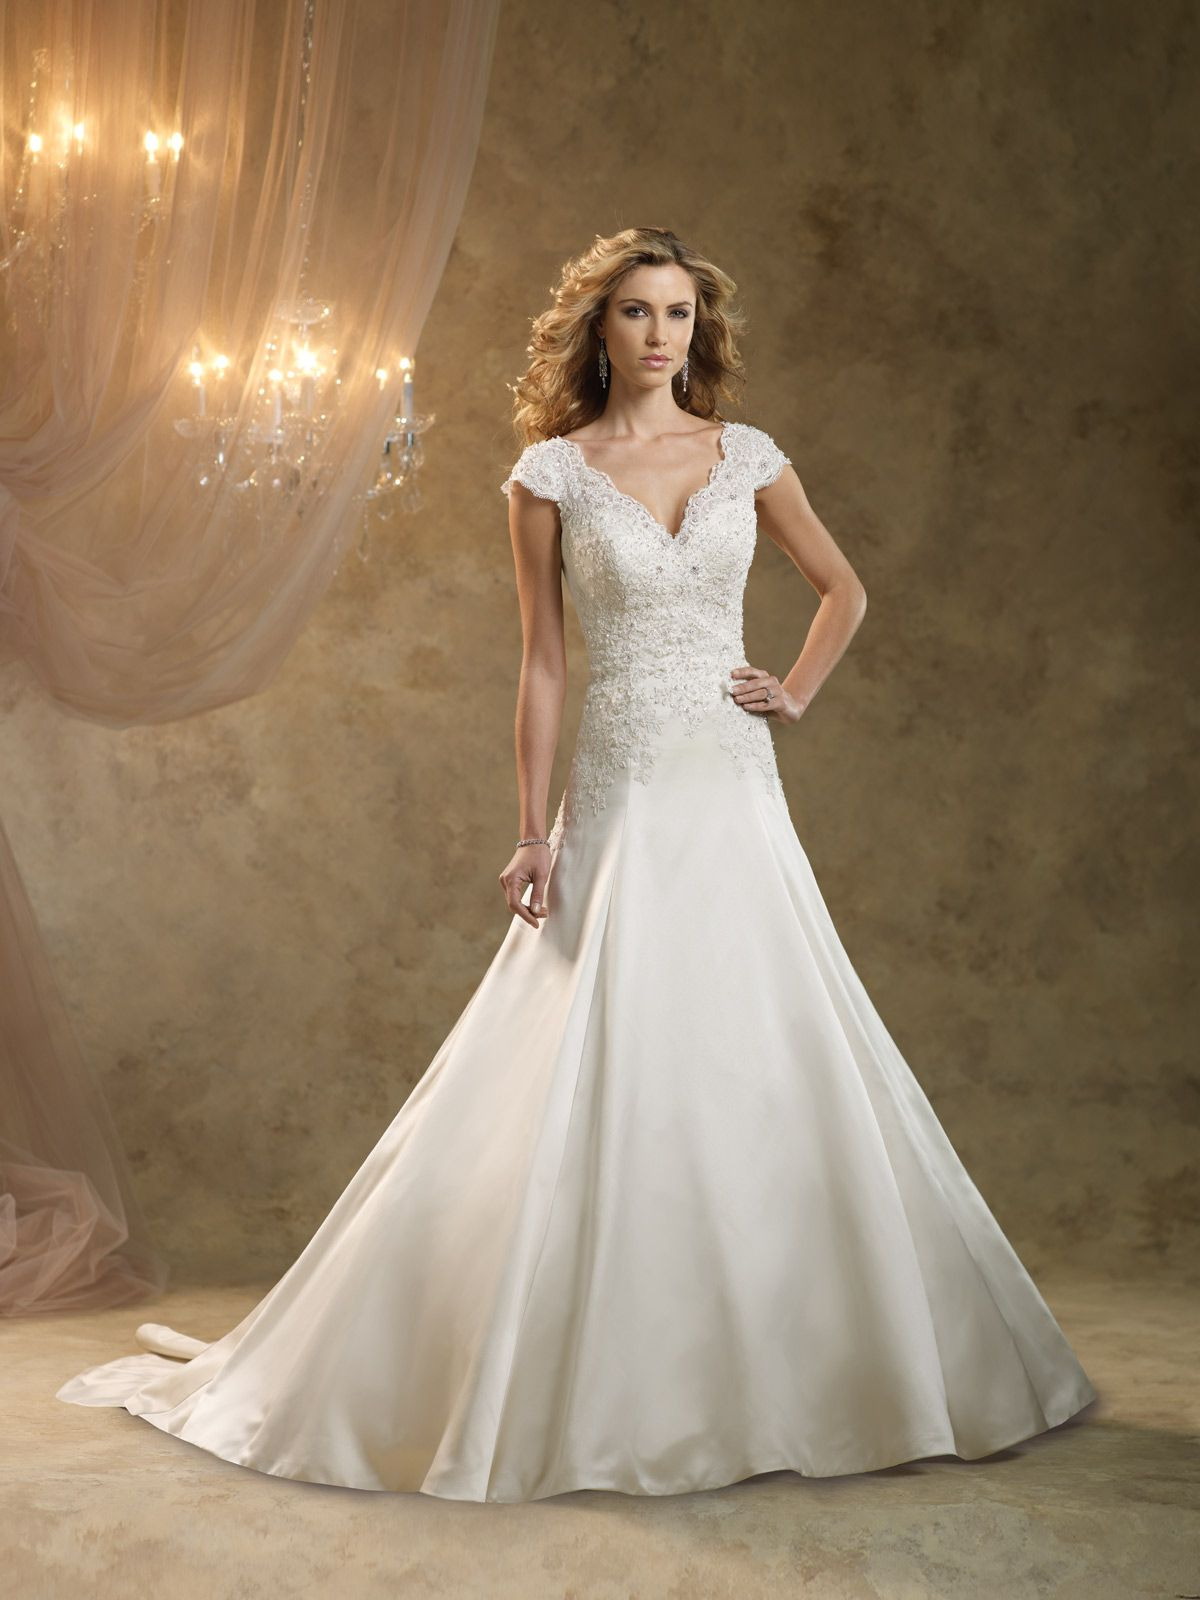 Strapless Allover 113200 Bebe - A Bridal Boutique LLC - Gainesville ...